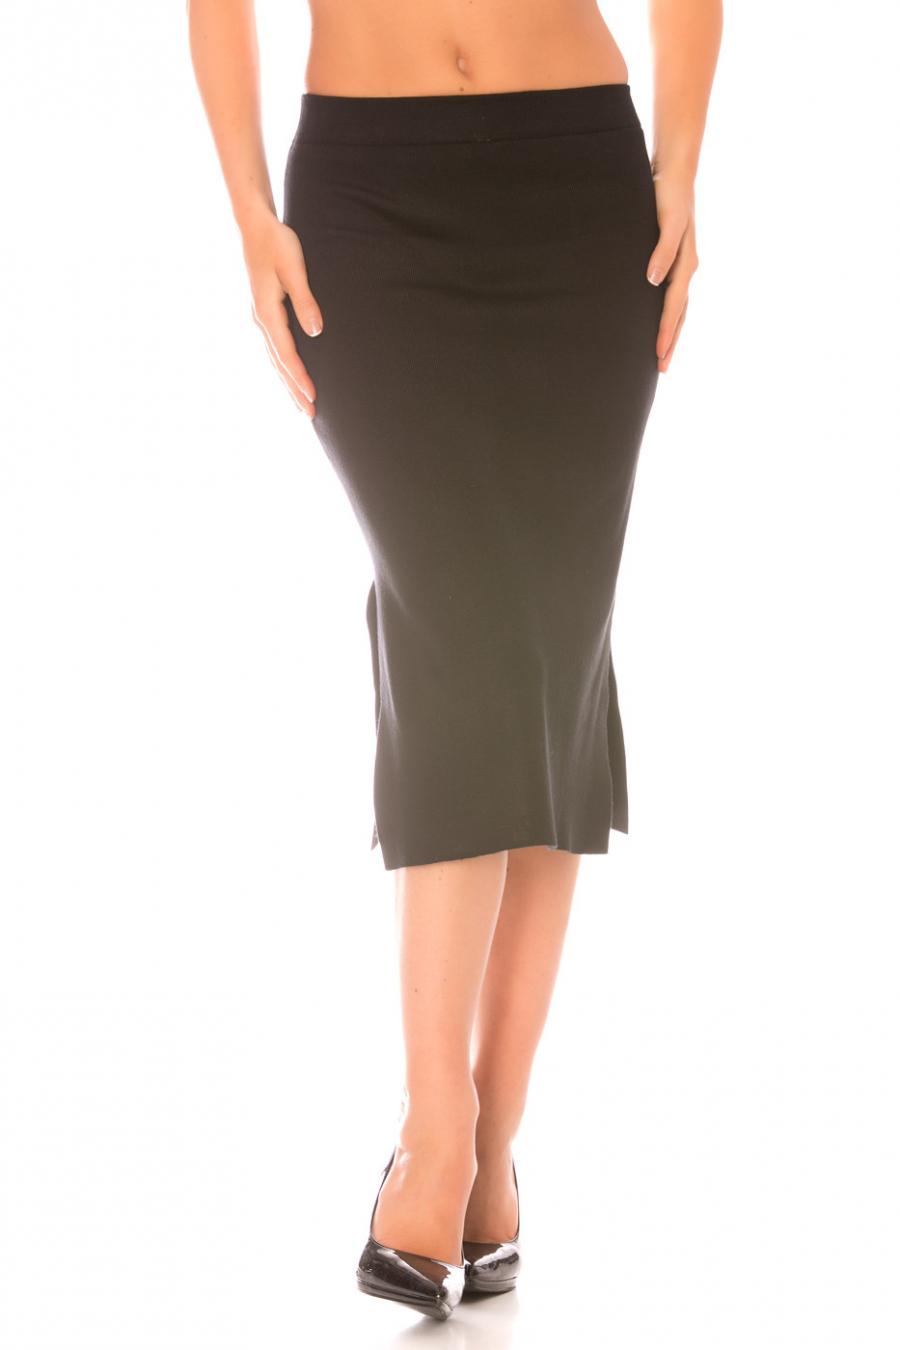 Sheath skirt slit at the bottom Black. F916